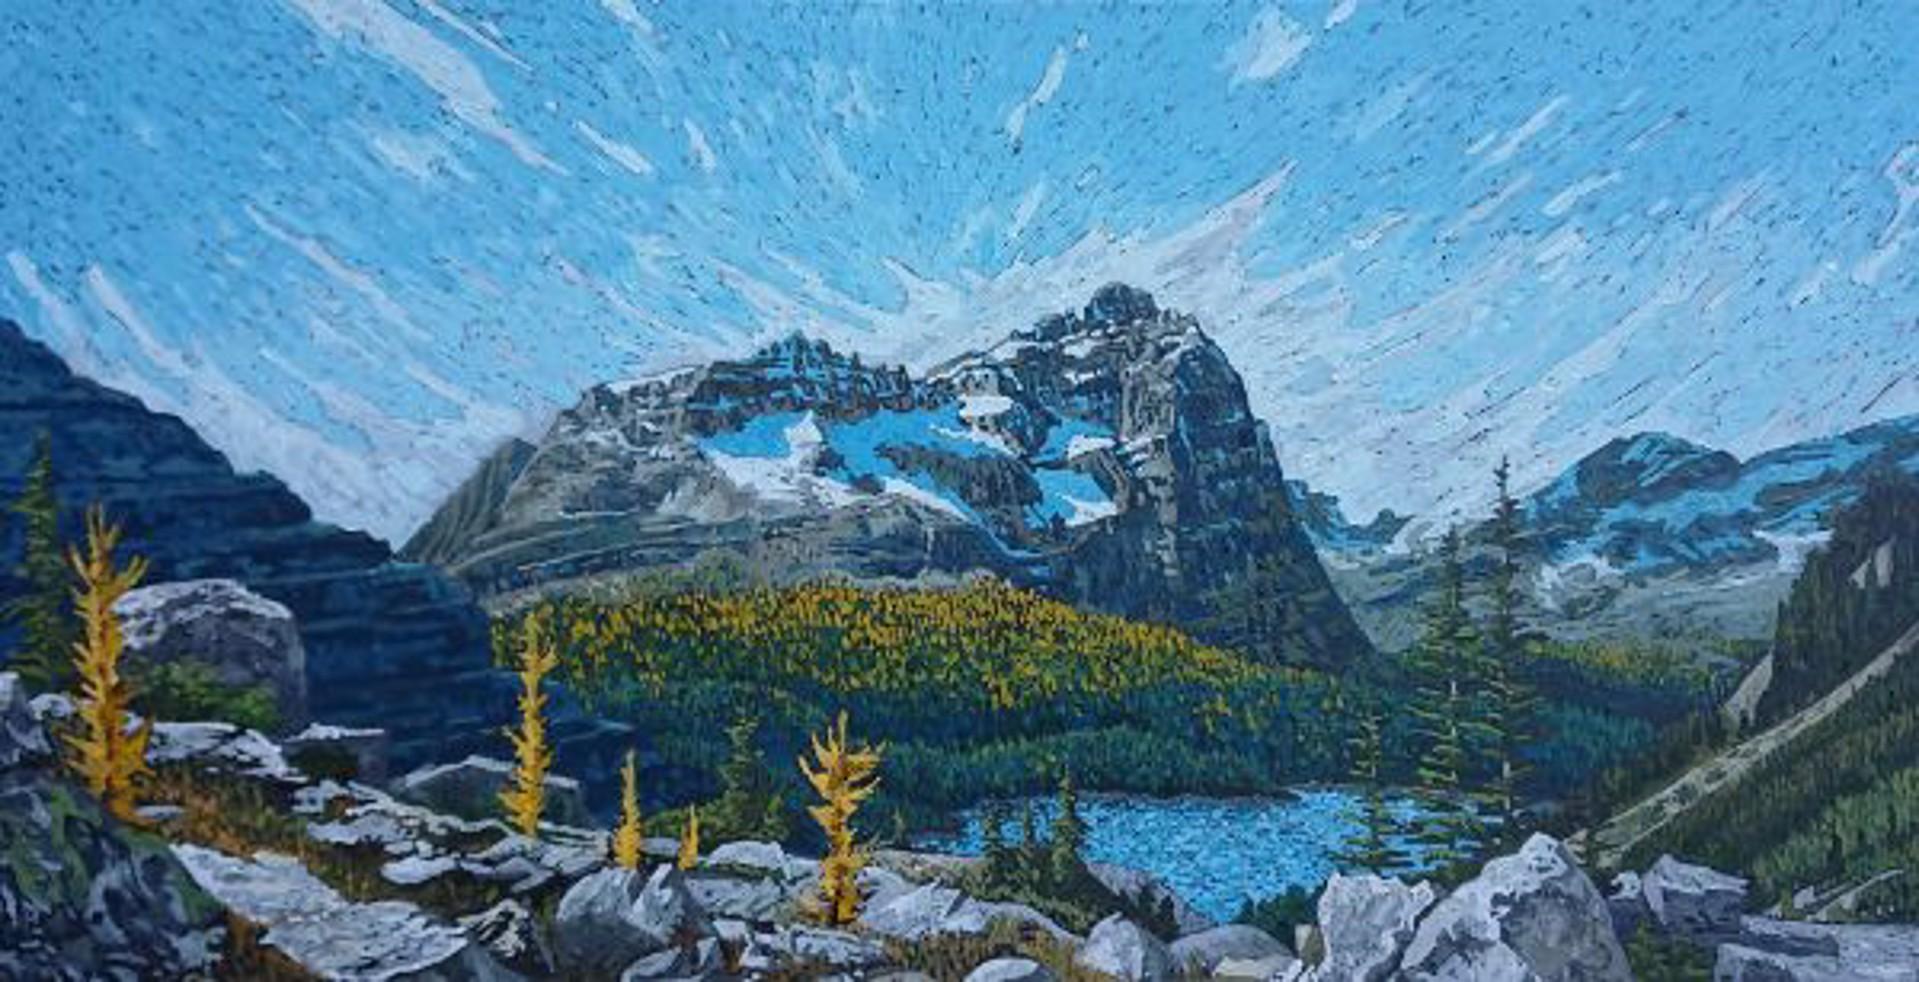 Mountain Glory by JOEL MARA